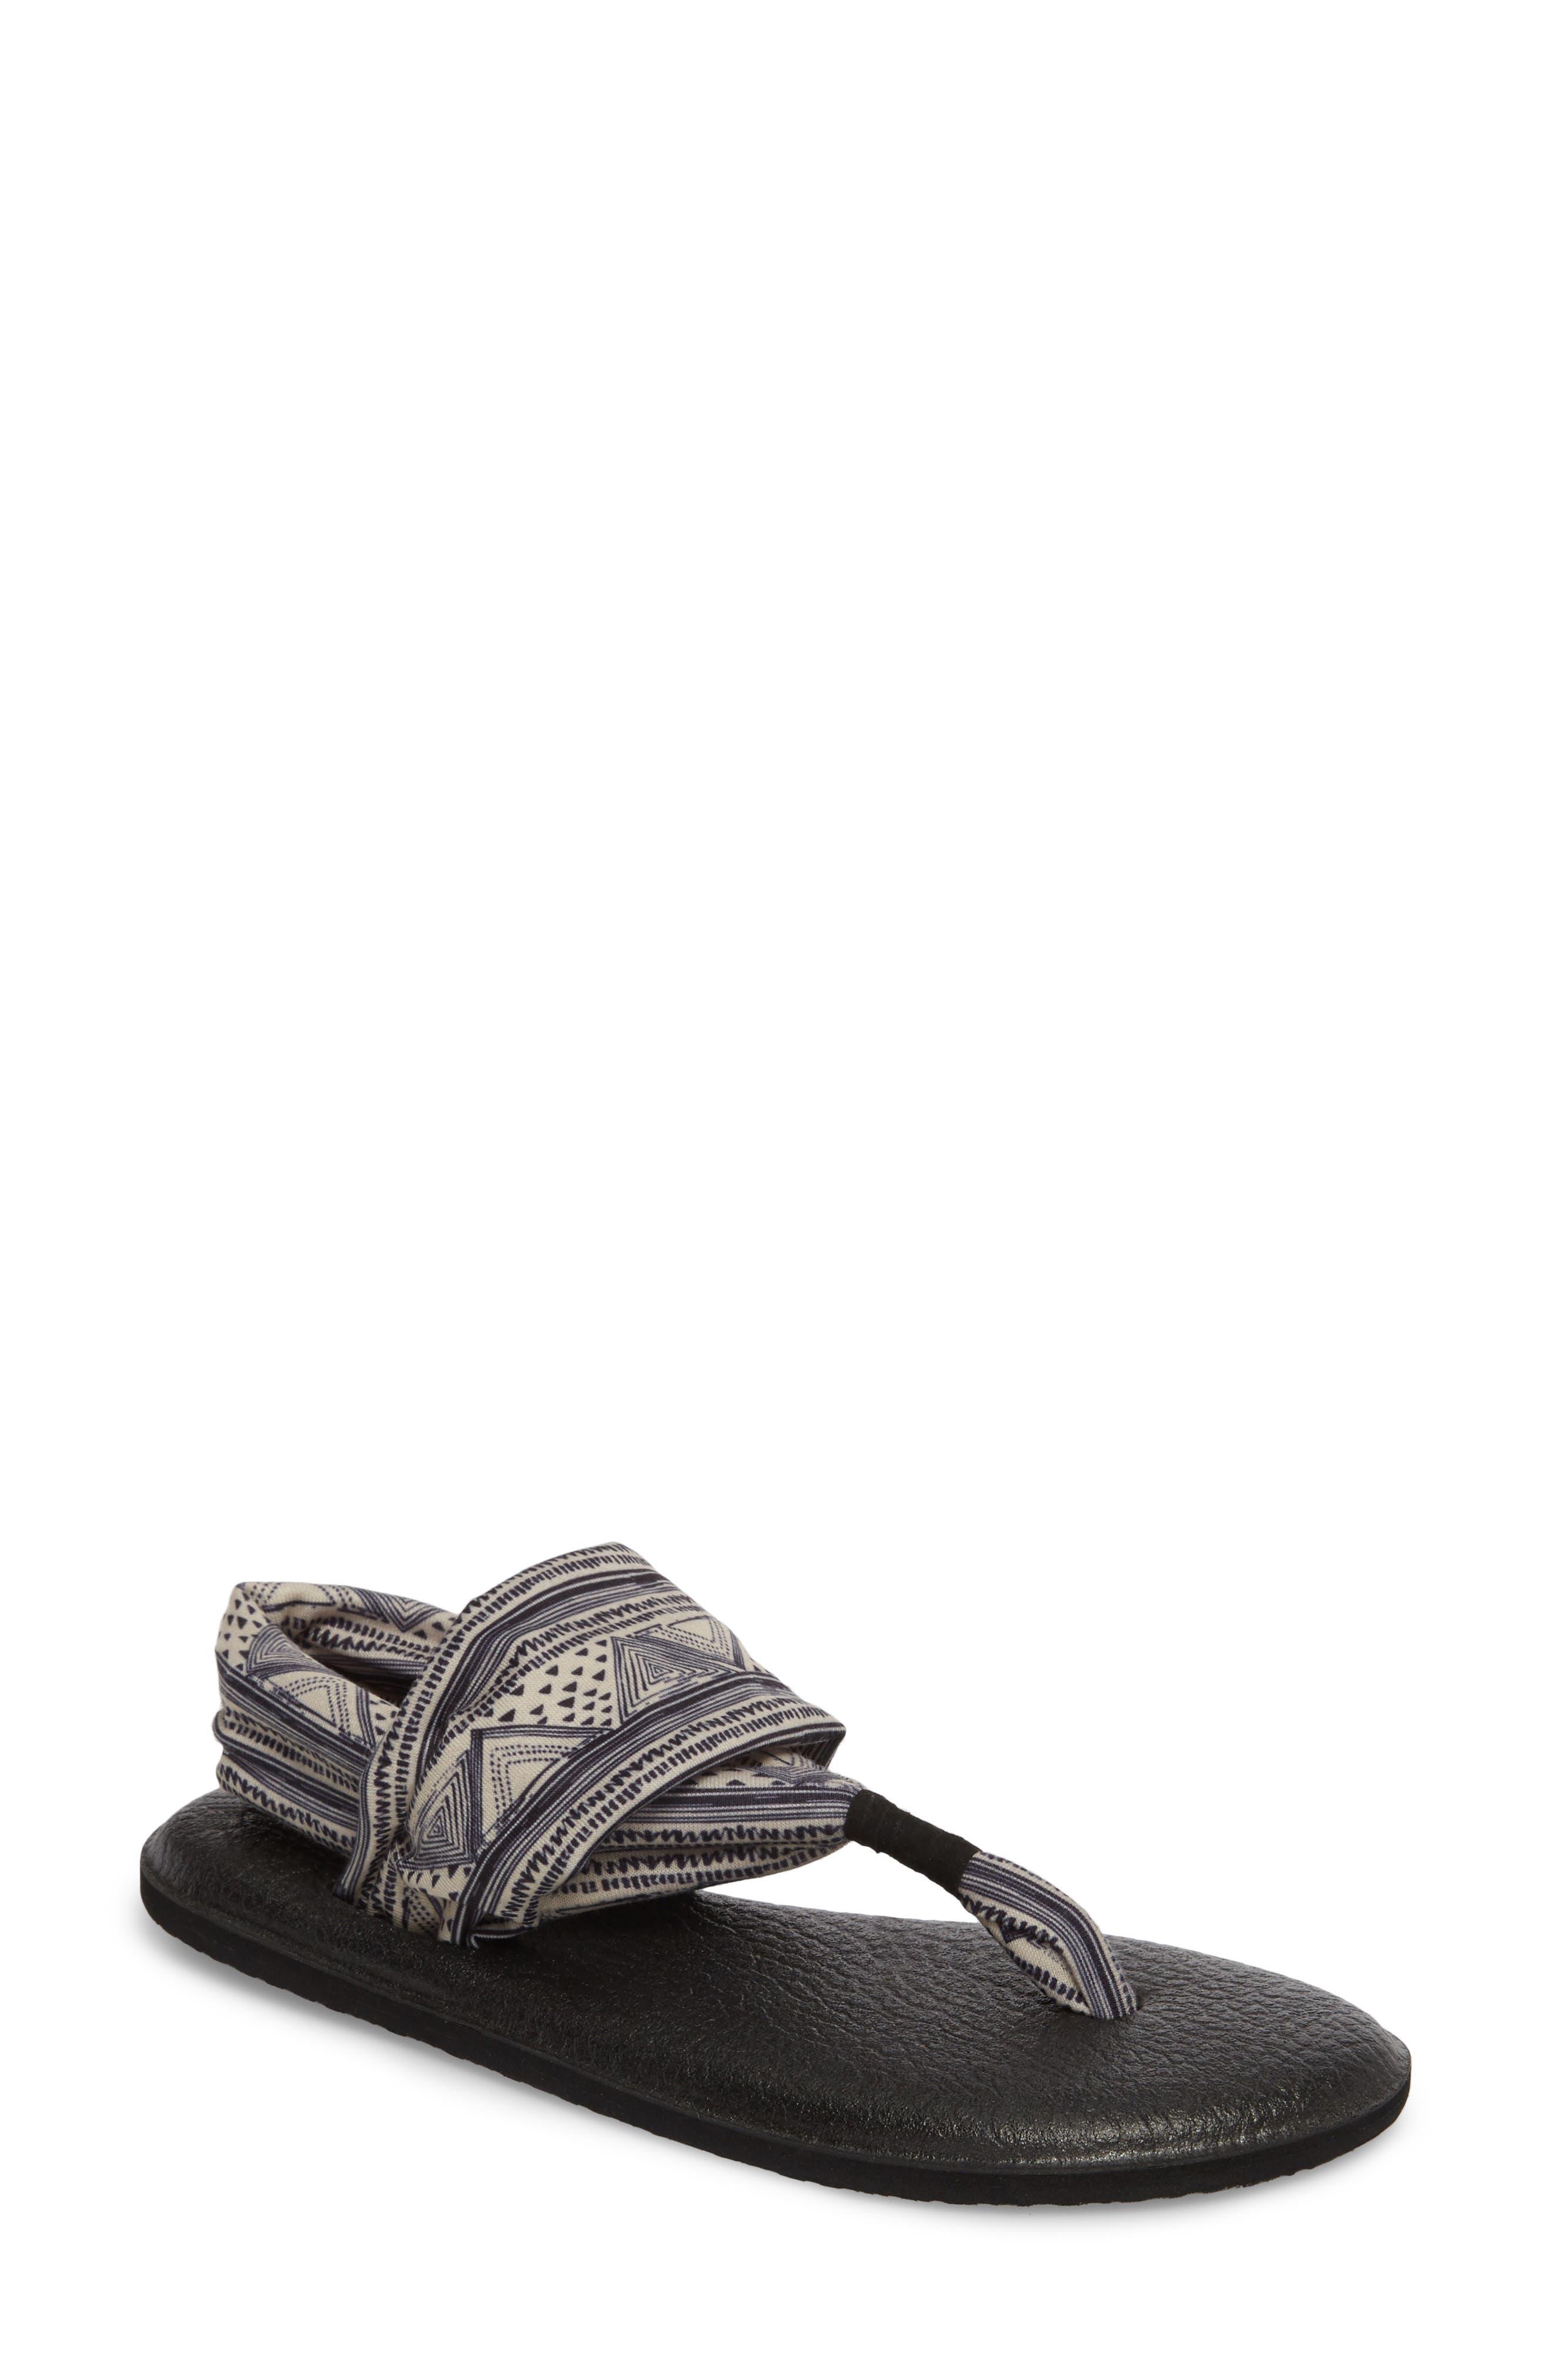 'Yoga Sling 2' Sandal,                             Main thumbnail 3, color,